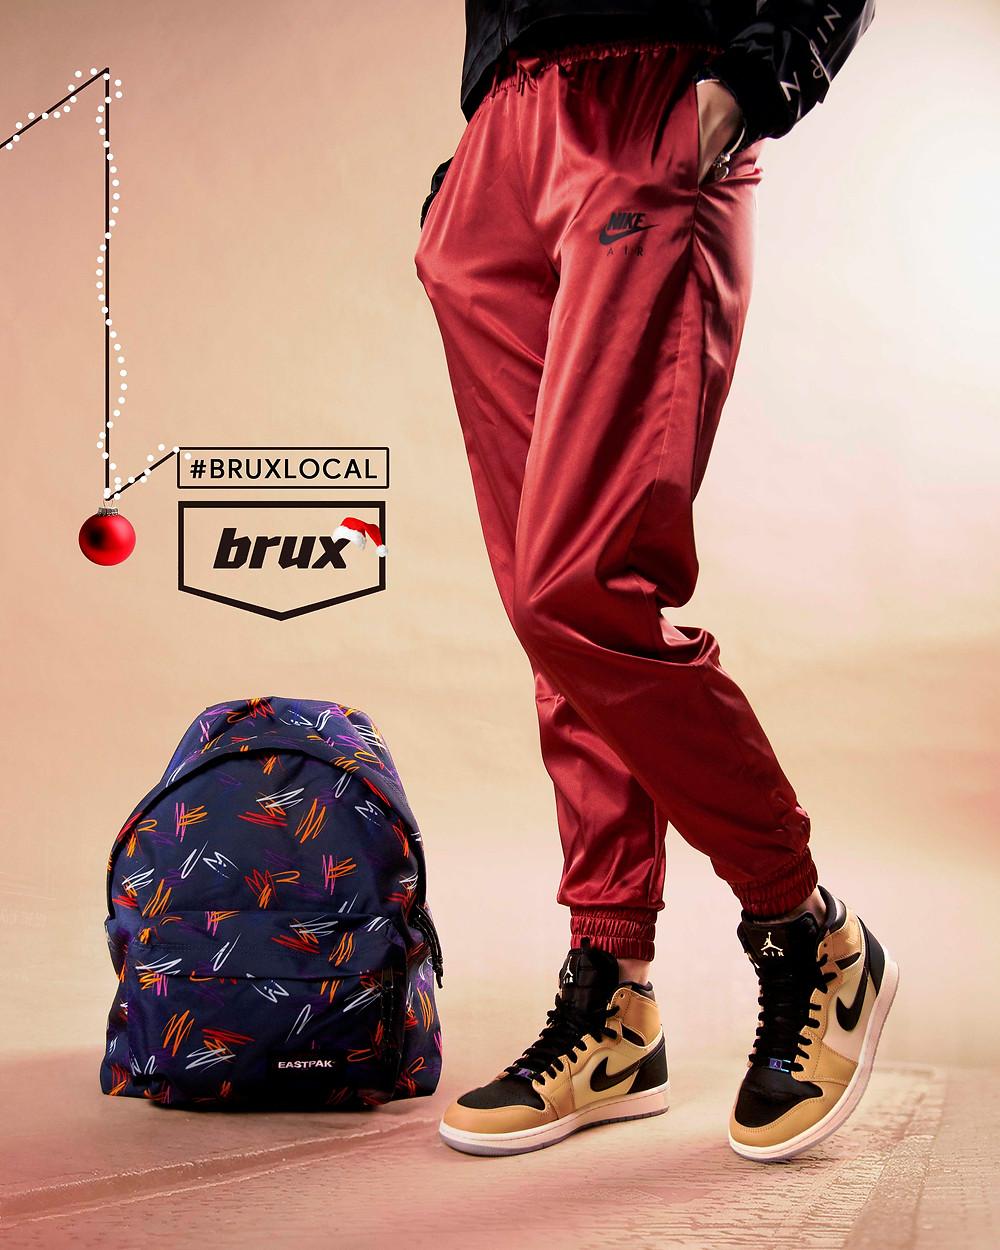 Рюкзак Eastpak, Кроссовки Air Jordan, Kazakhstan fashion, Brux алматы, Бракс новых год,